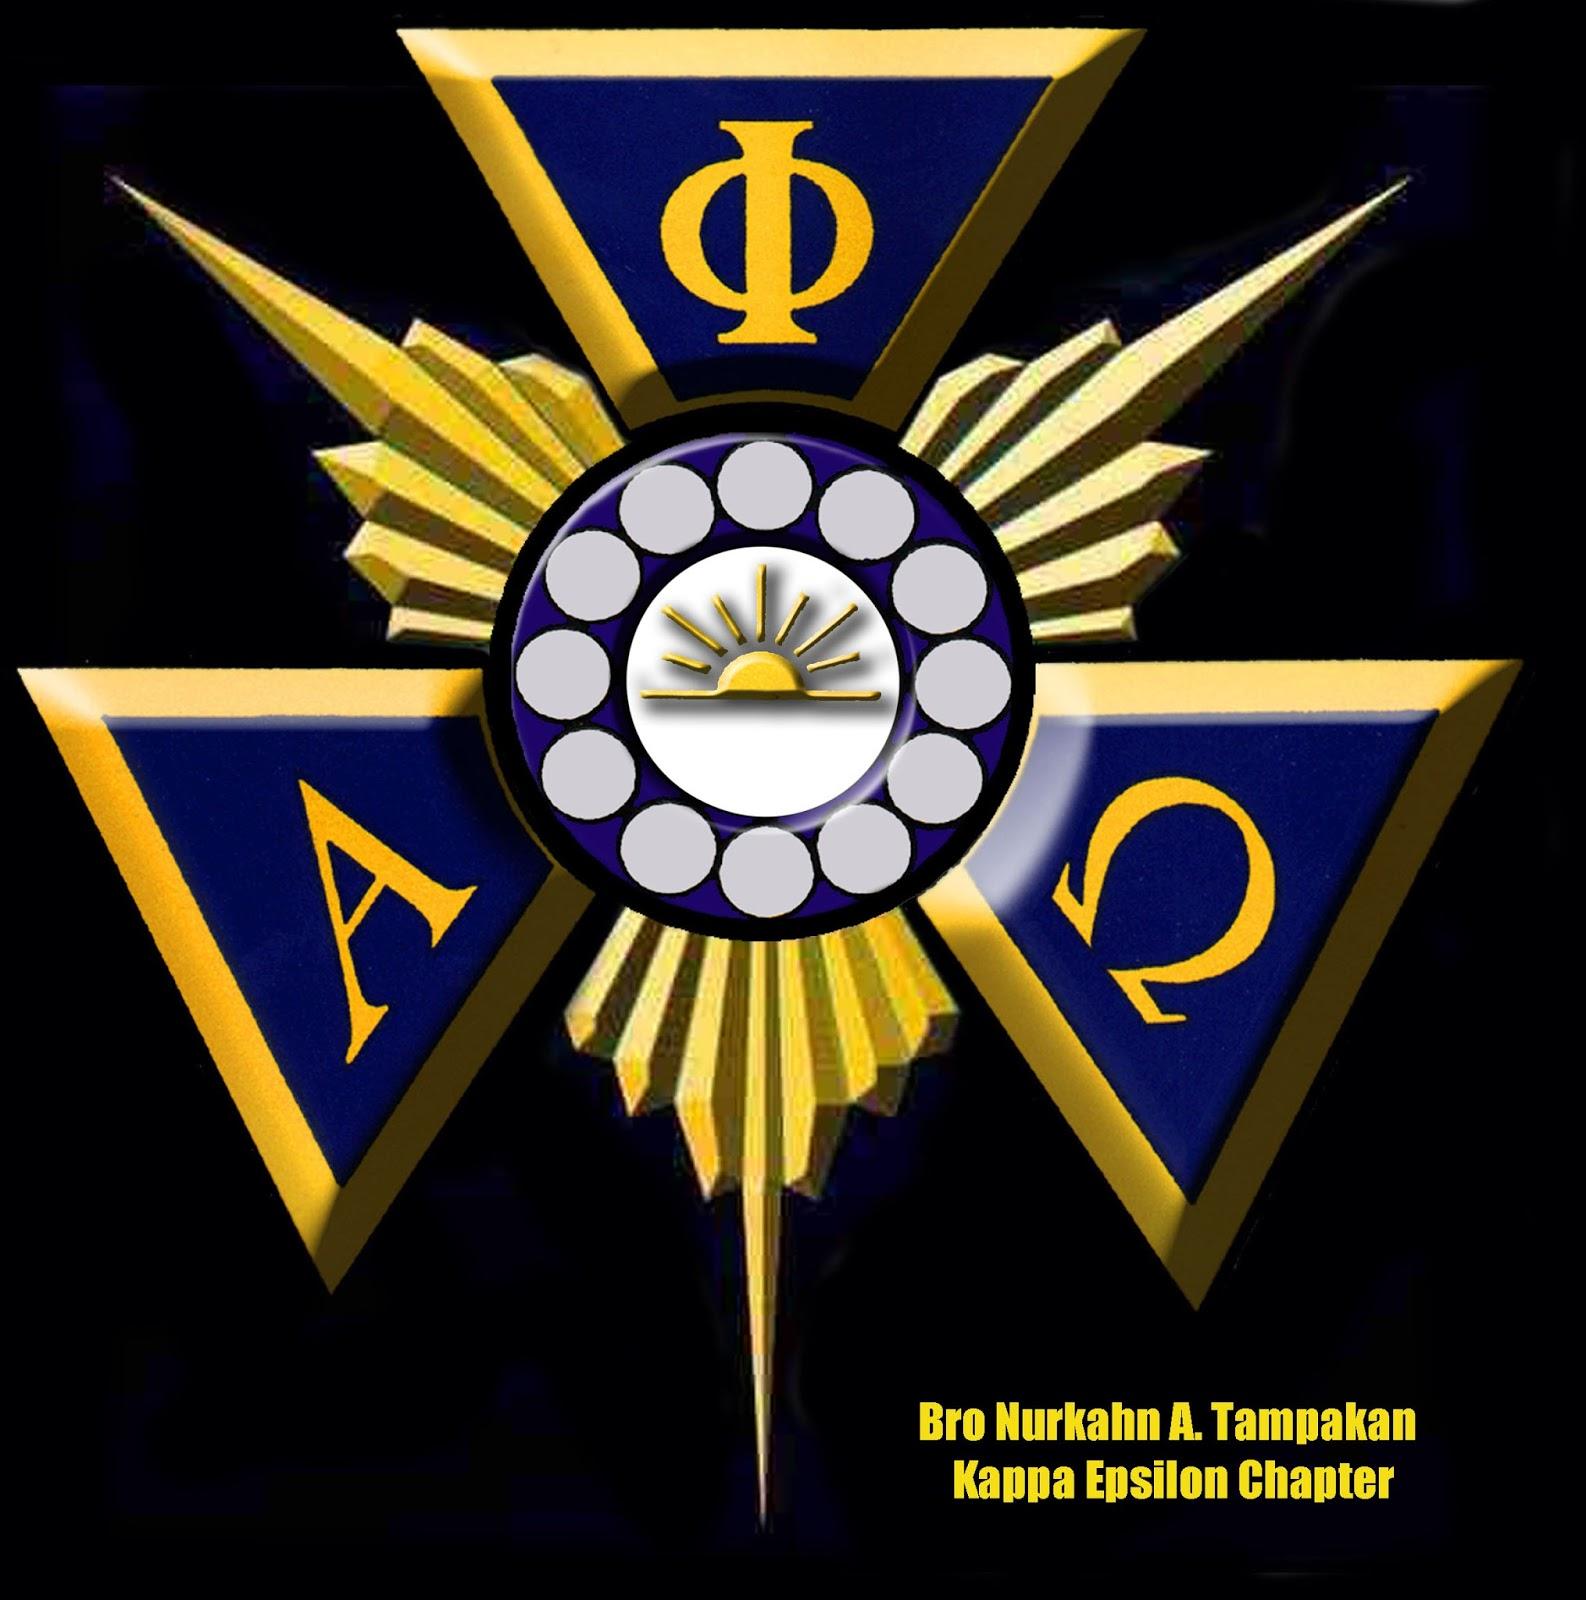 brotherhood fraternity essay